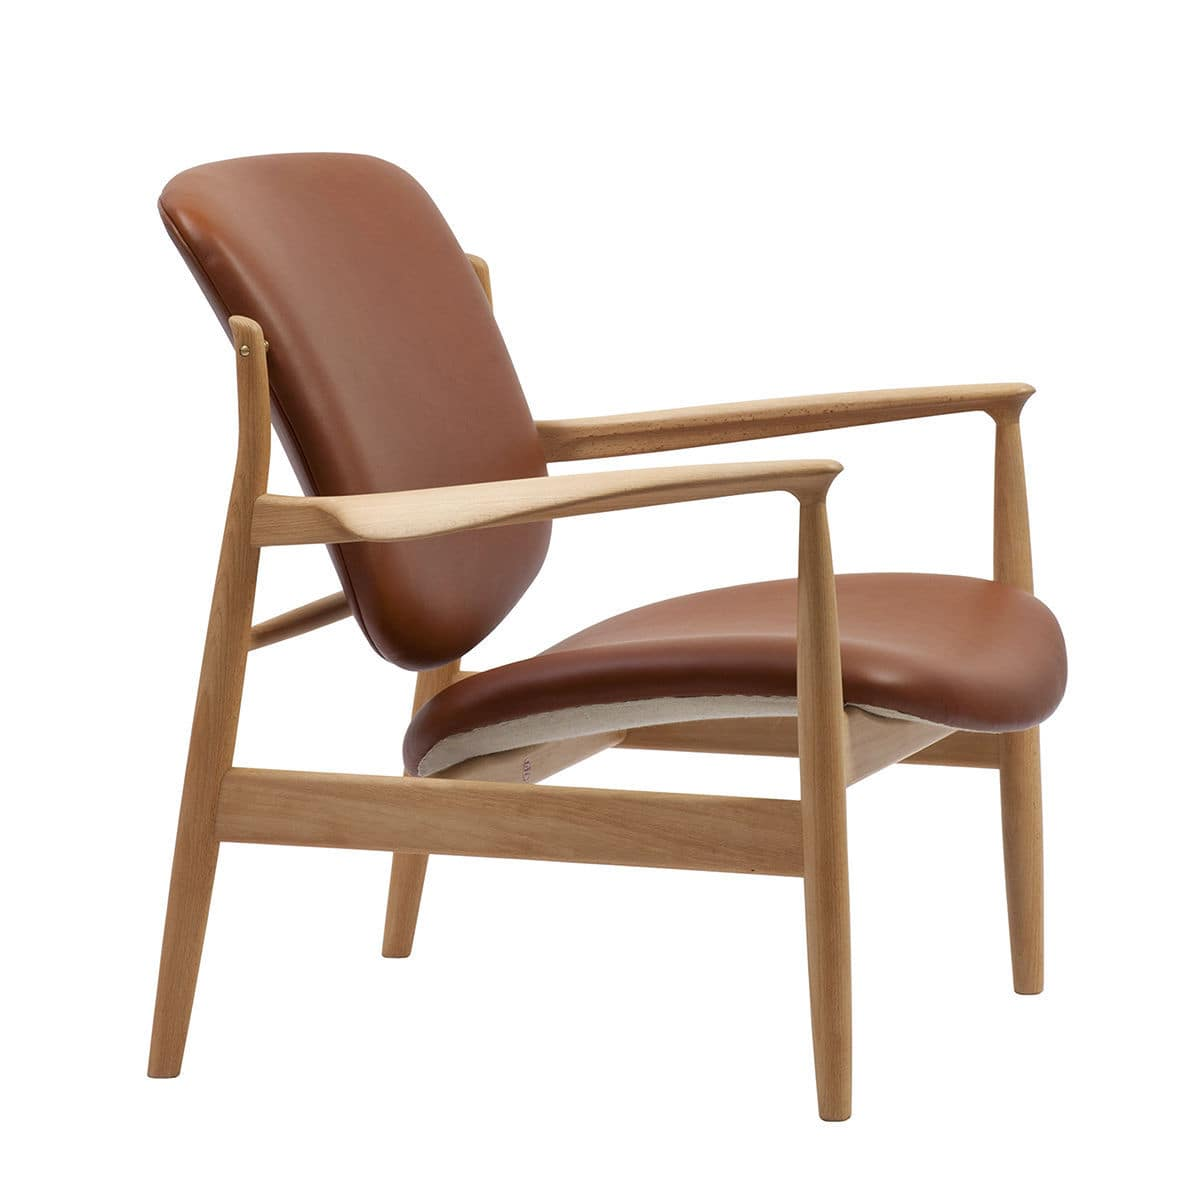 Scandinavian Design Armchair Wooden Fabric Leather France